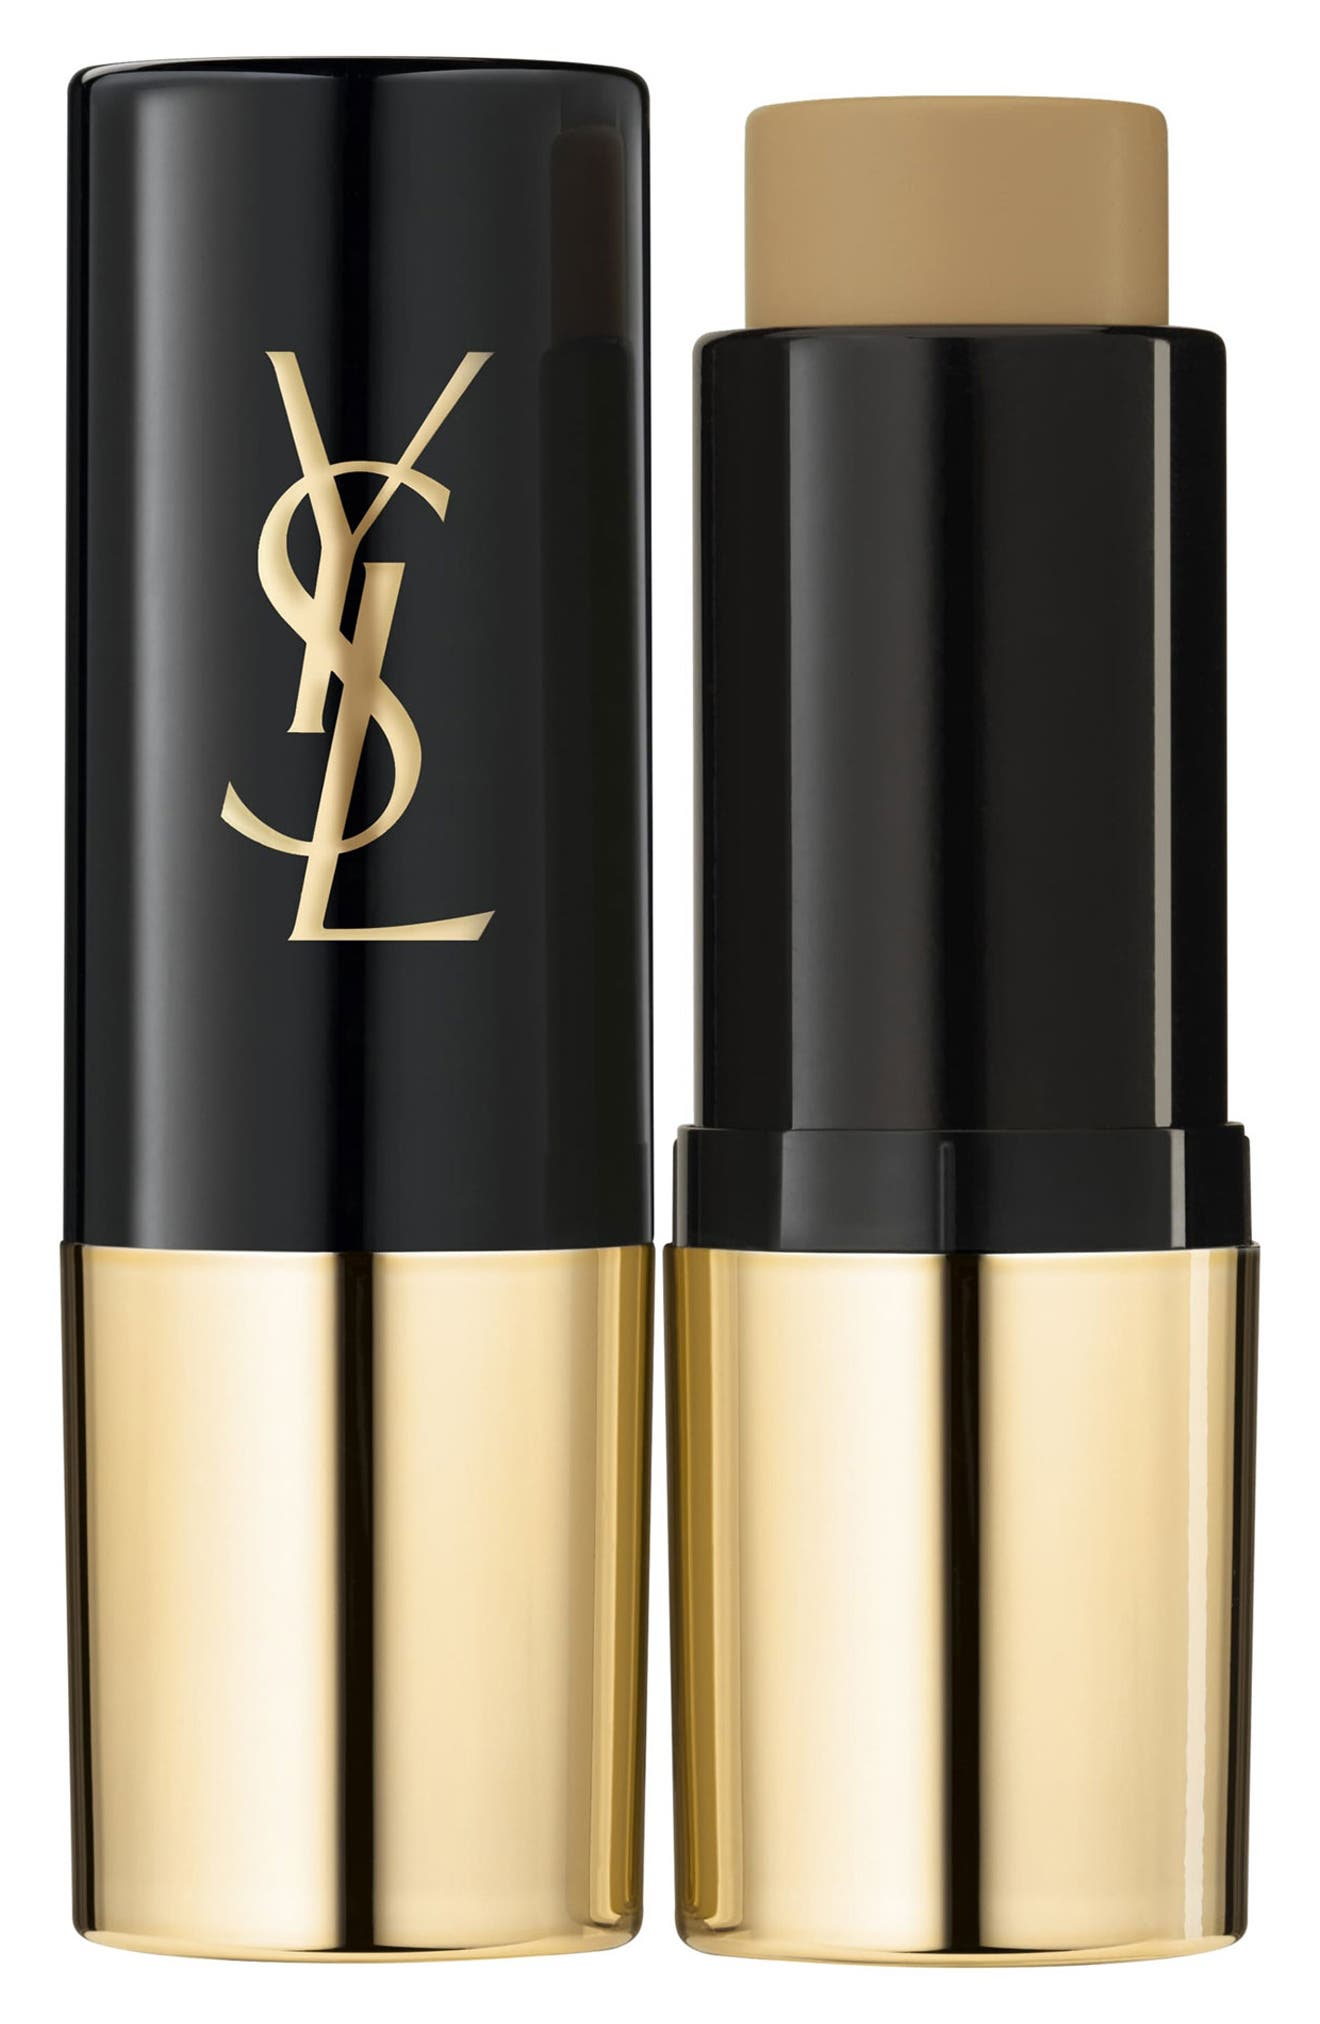 Yves Saint Laurent All Hours Foundation Stick - Bd50 Warm Honey